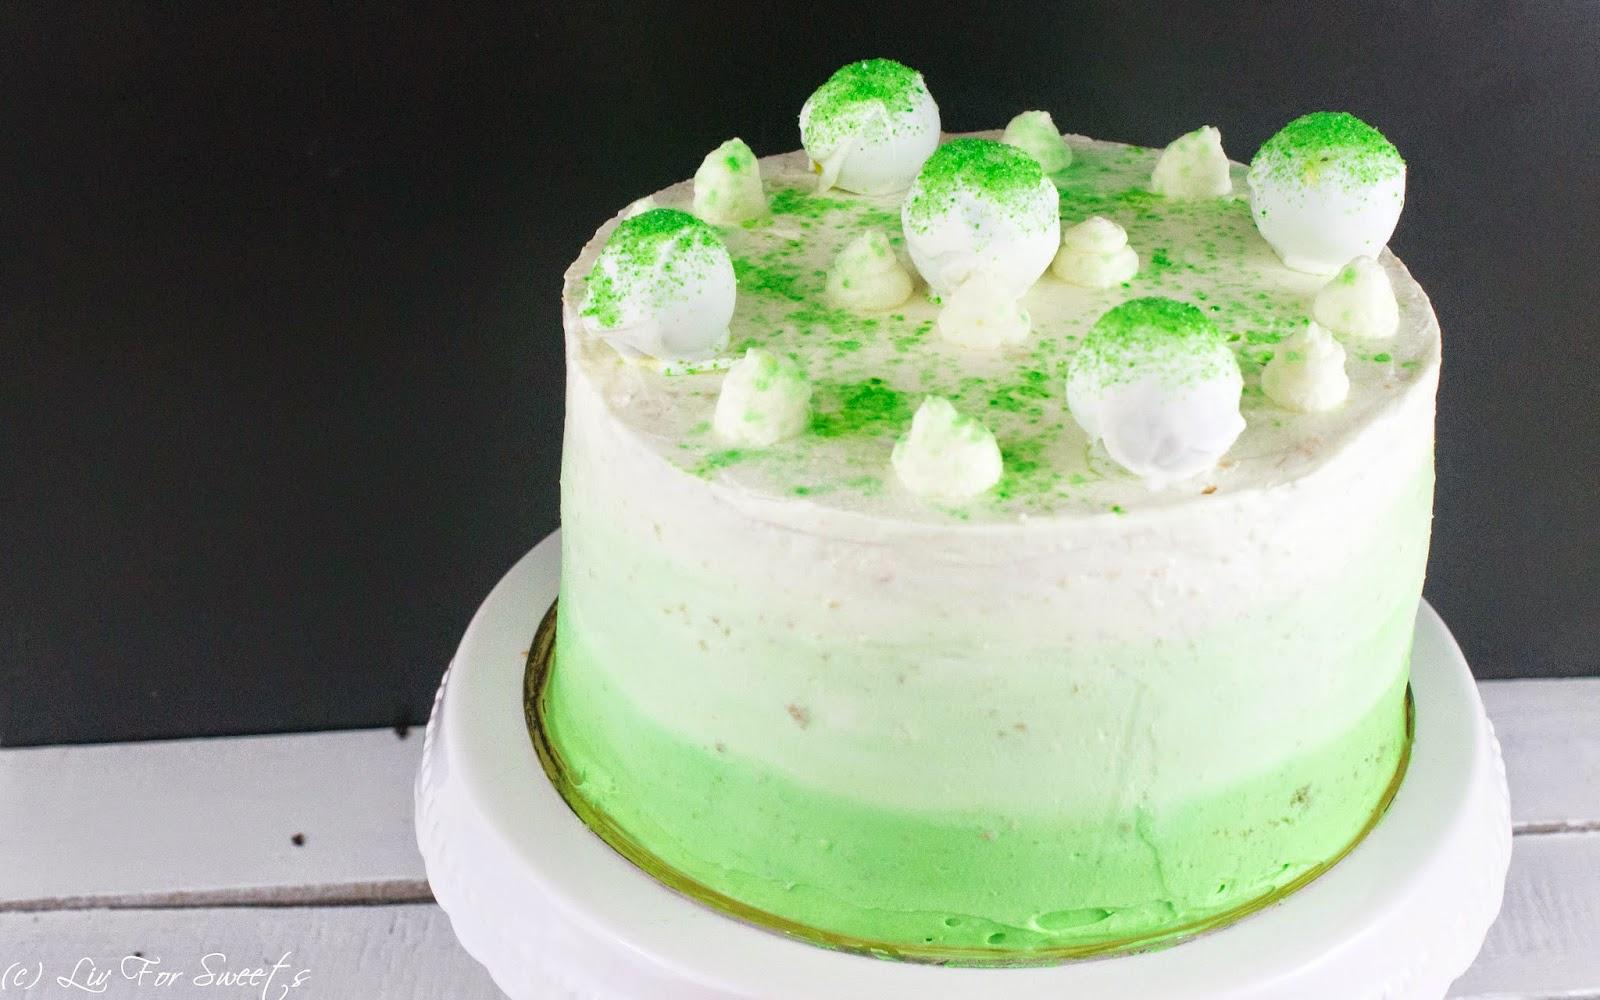 Limetten, Käsesahne, Quark, Frischkäse, Cakebites, Cake-Bites, Cakepops, Cake-Pops, Cakepop-Torte, Cakebite-Torte, grün, Ombre-Frosting, Ombre-Torte, Thermomix